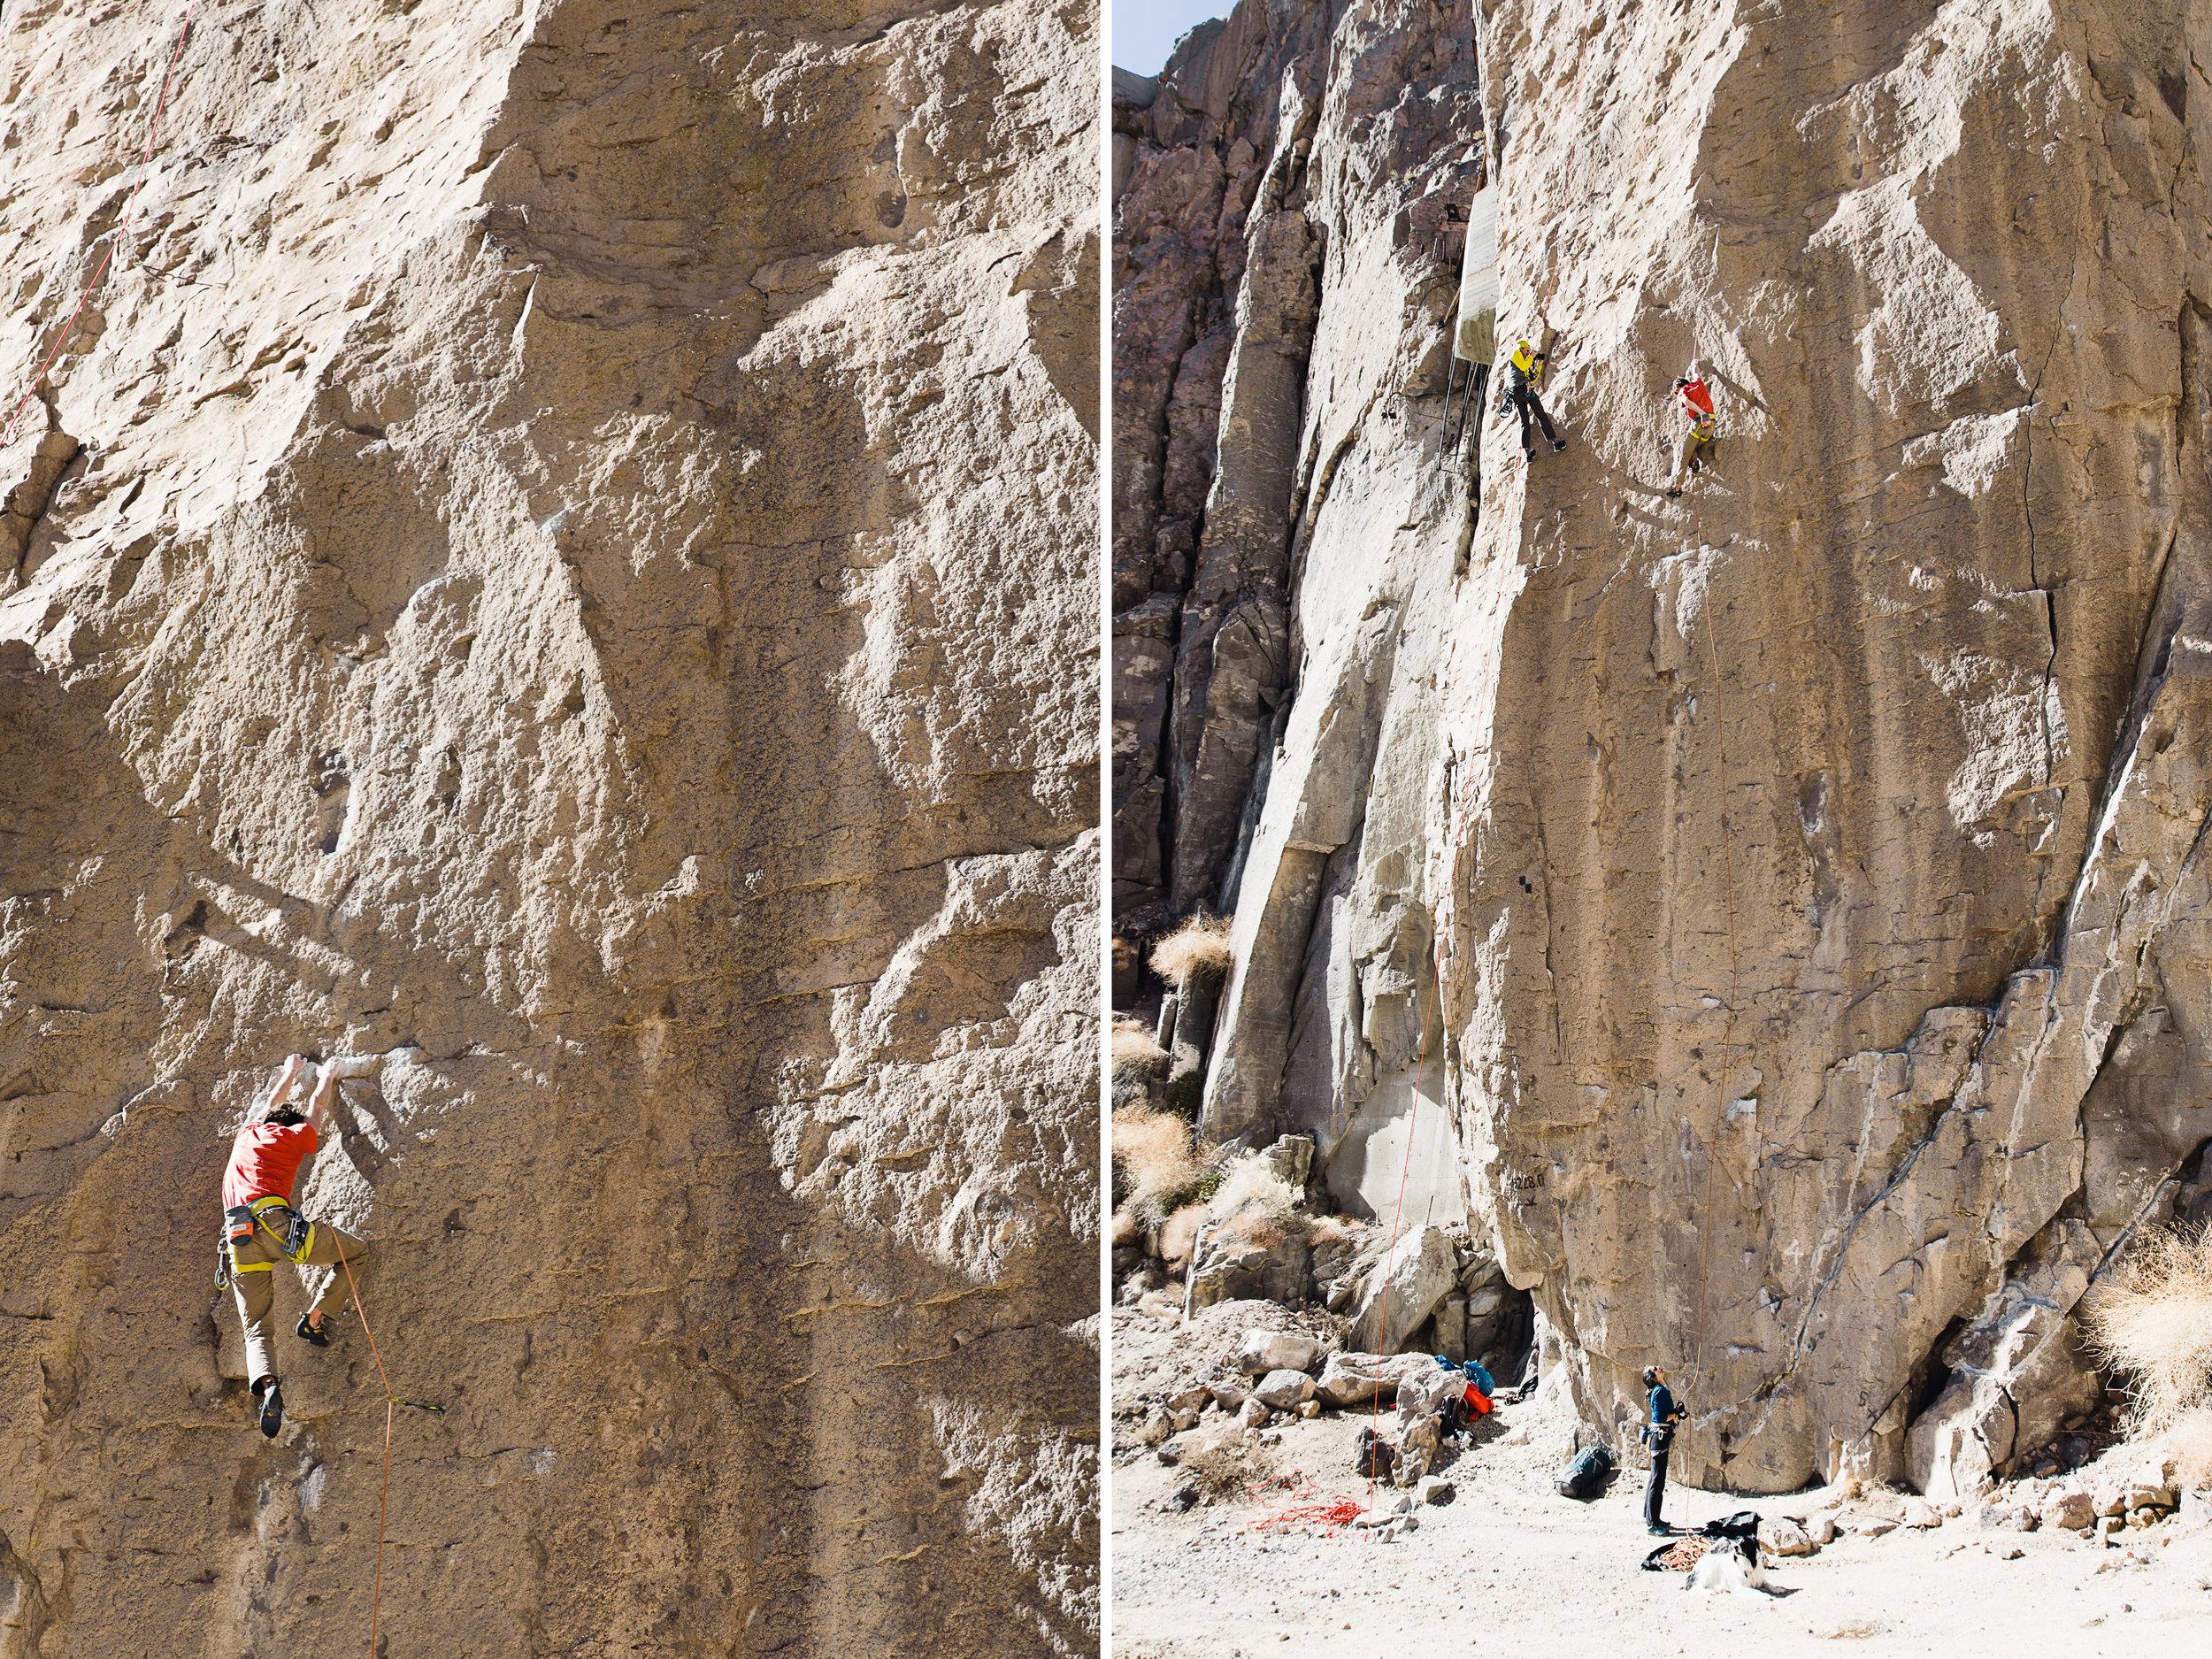 rock-climbing-photography-15.jpg